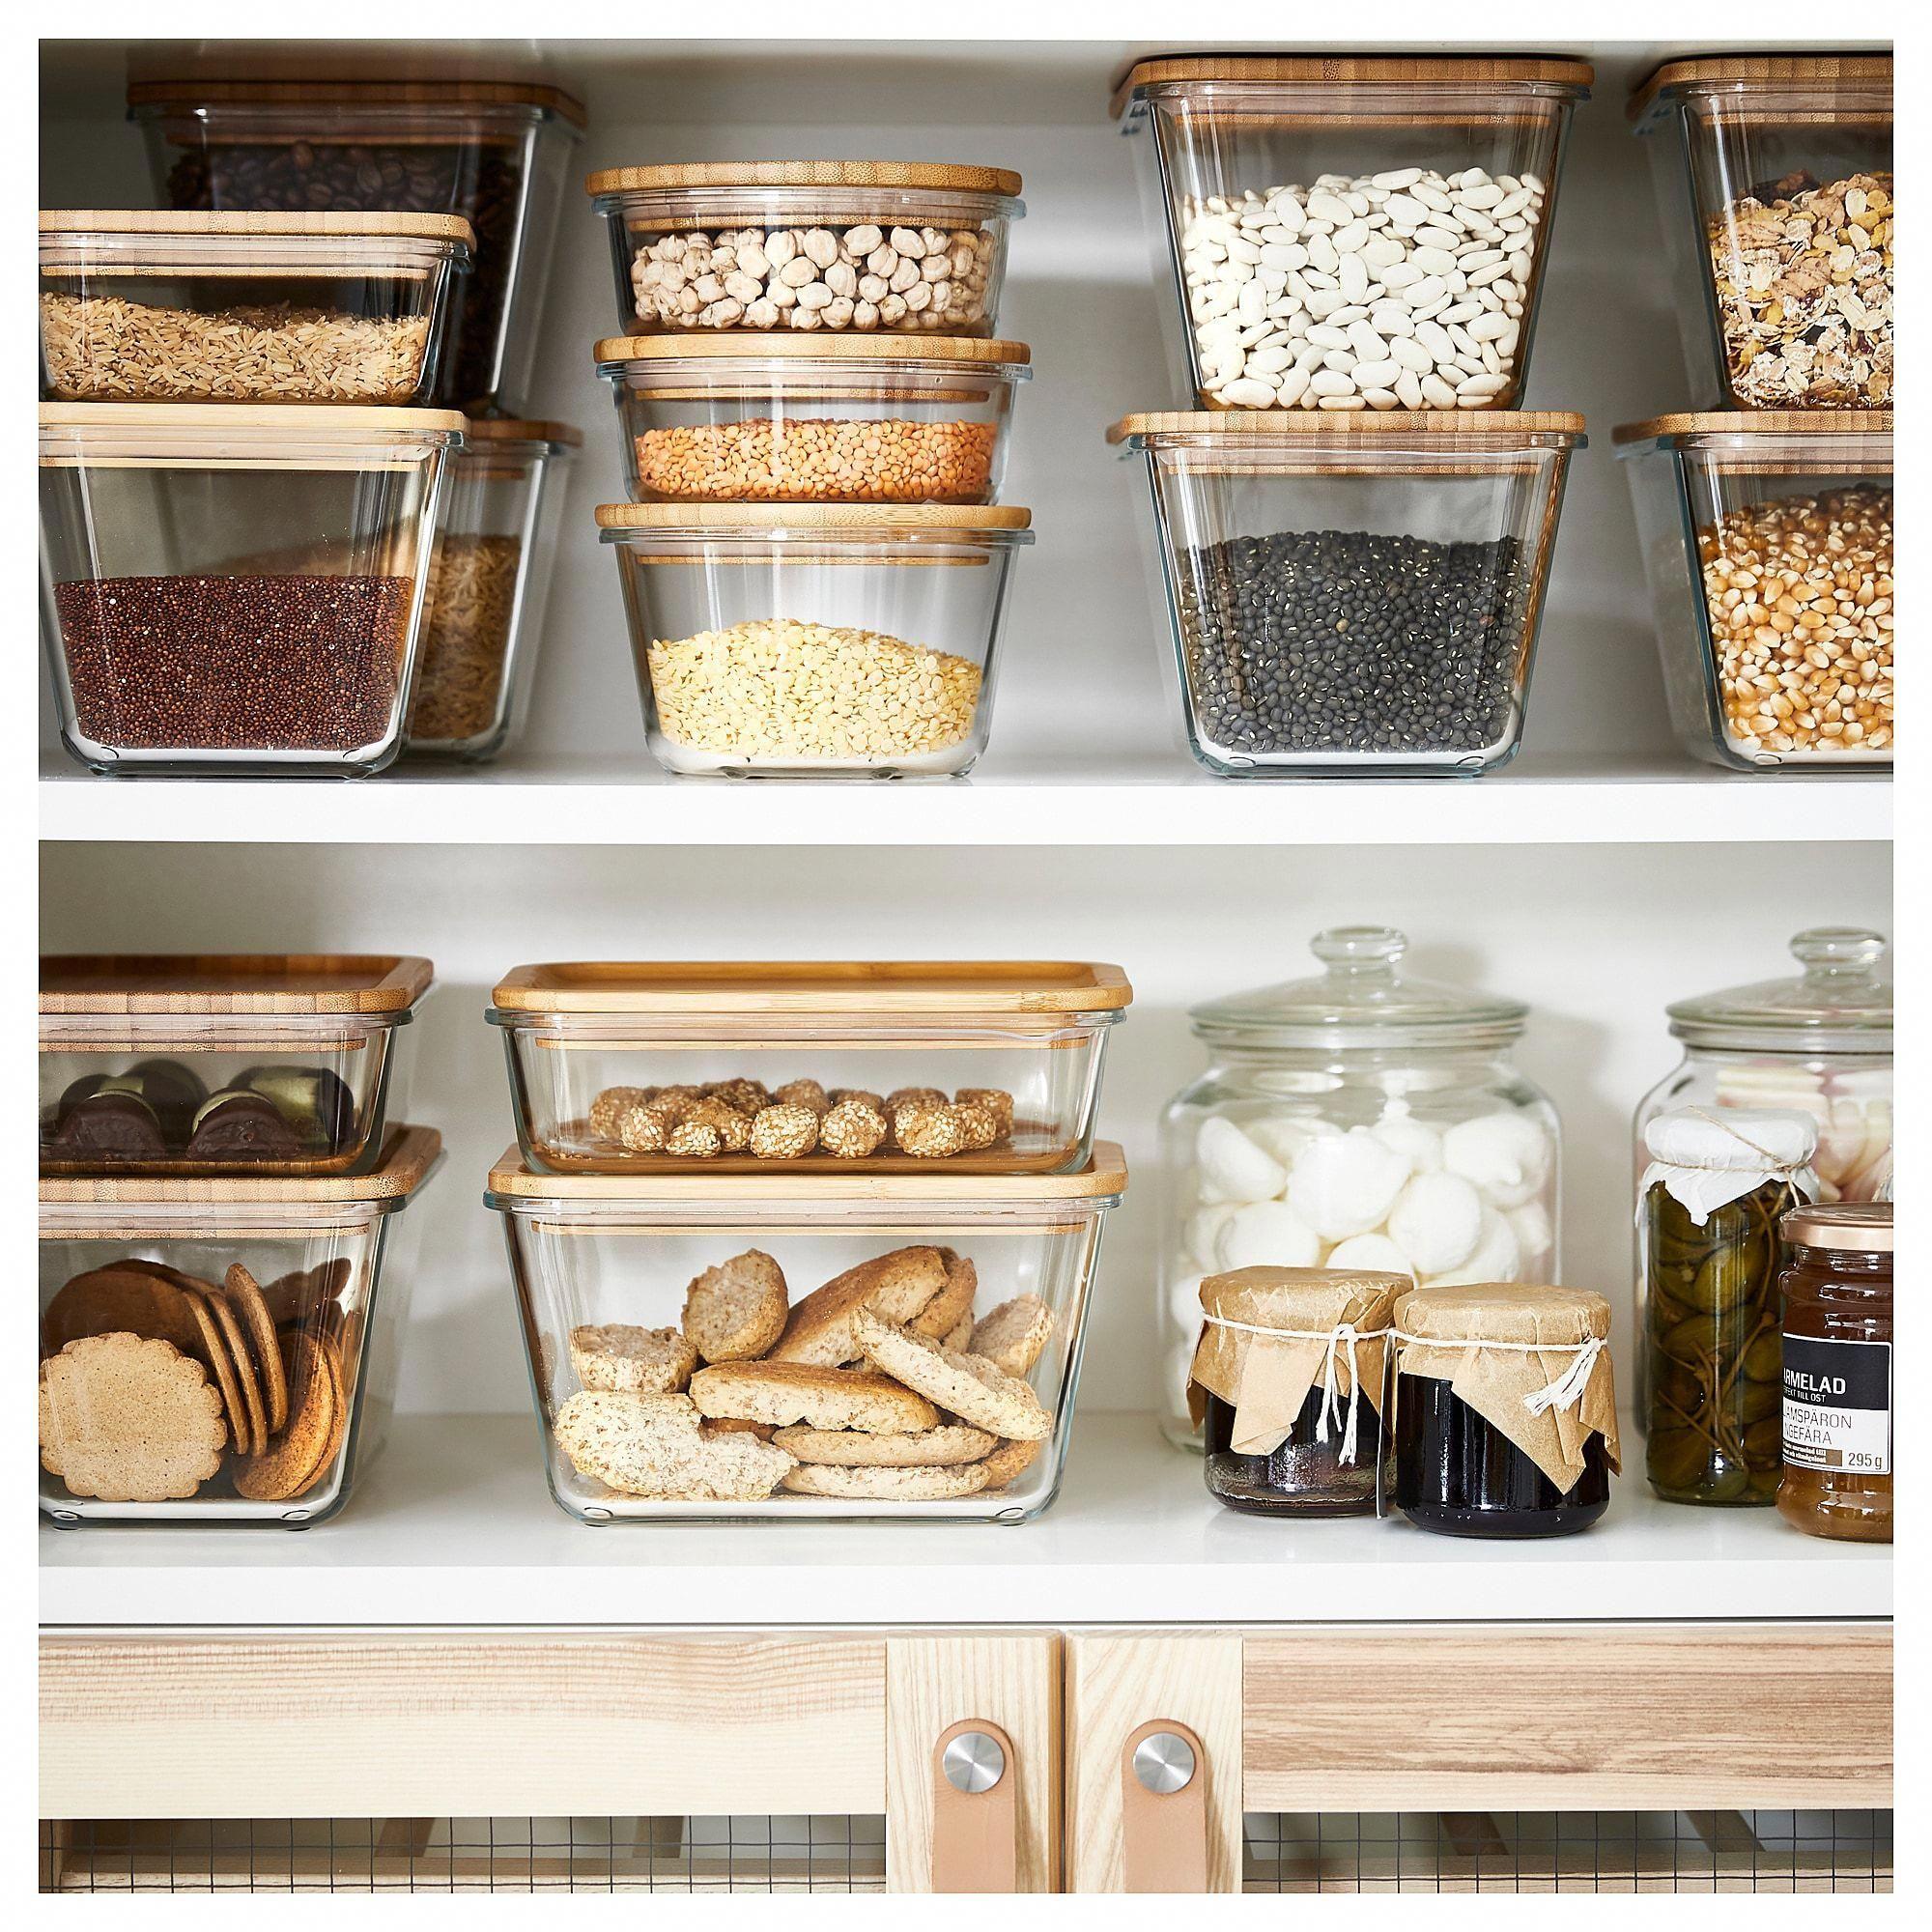 IKEA 365+ Food container - rectangular, glass - IKEA #kitchenpantryorganization